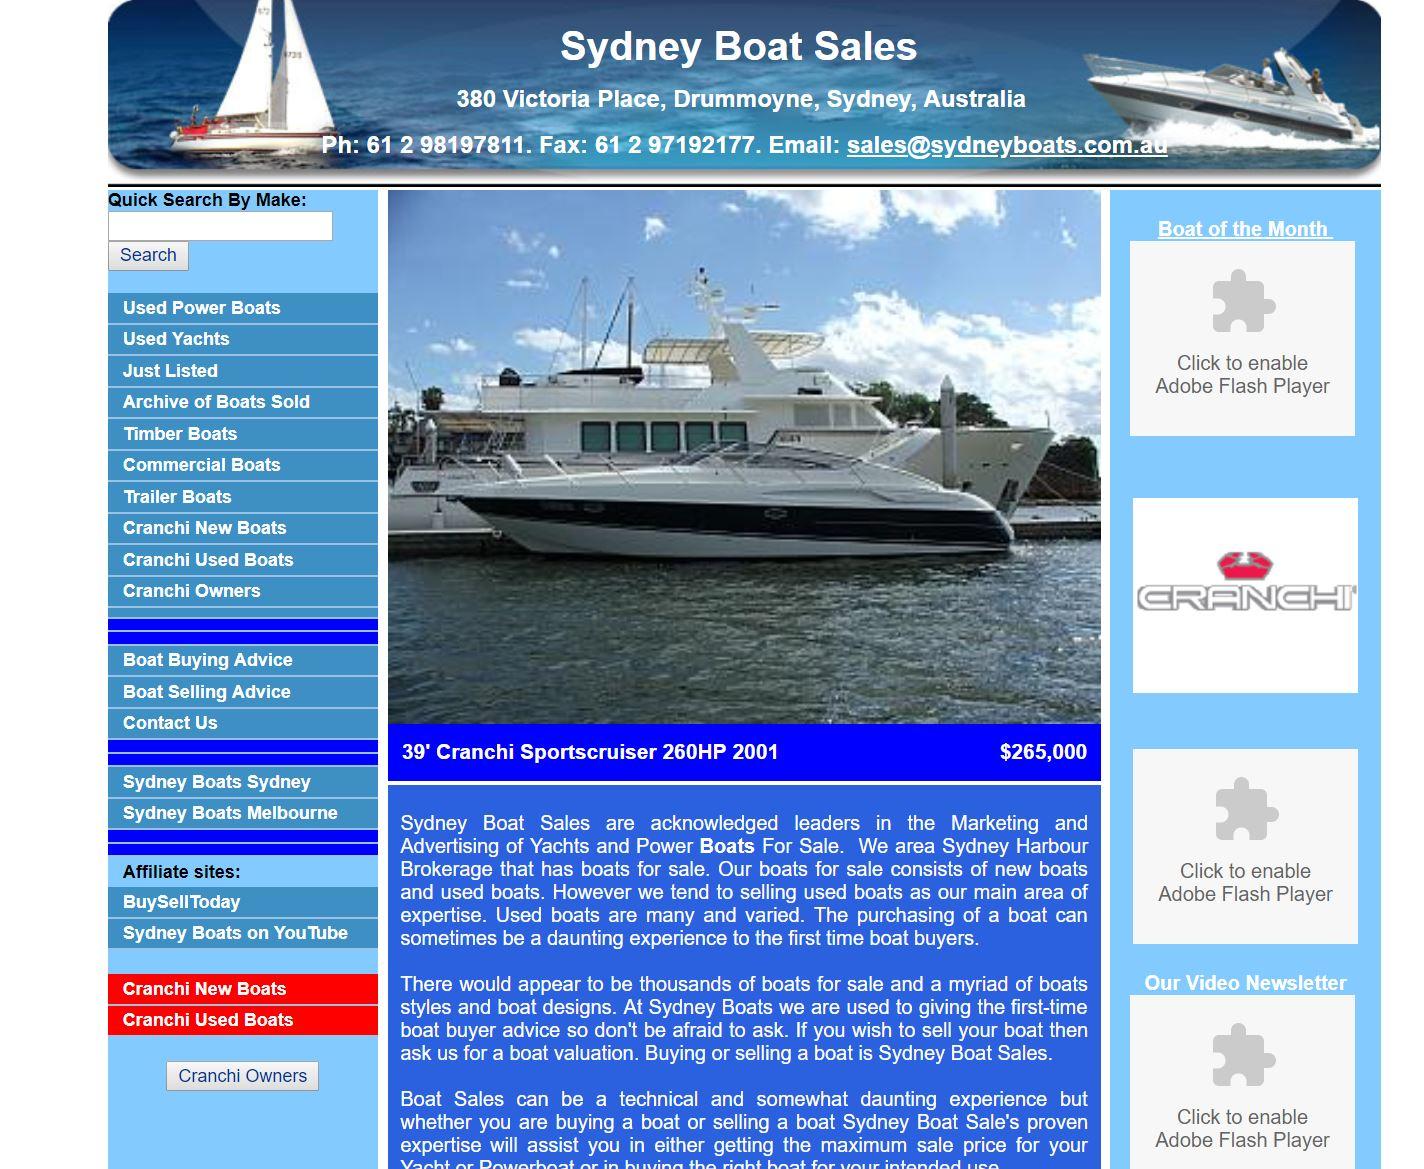 sydneyboats3